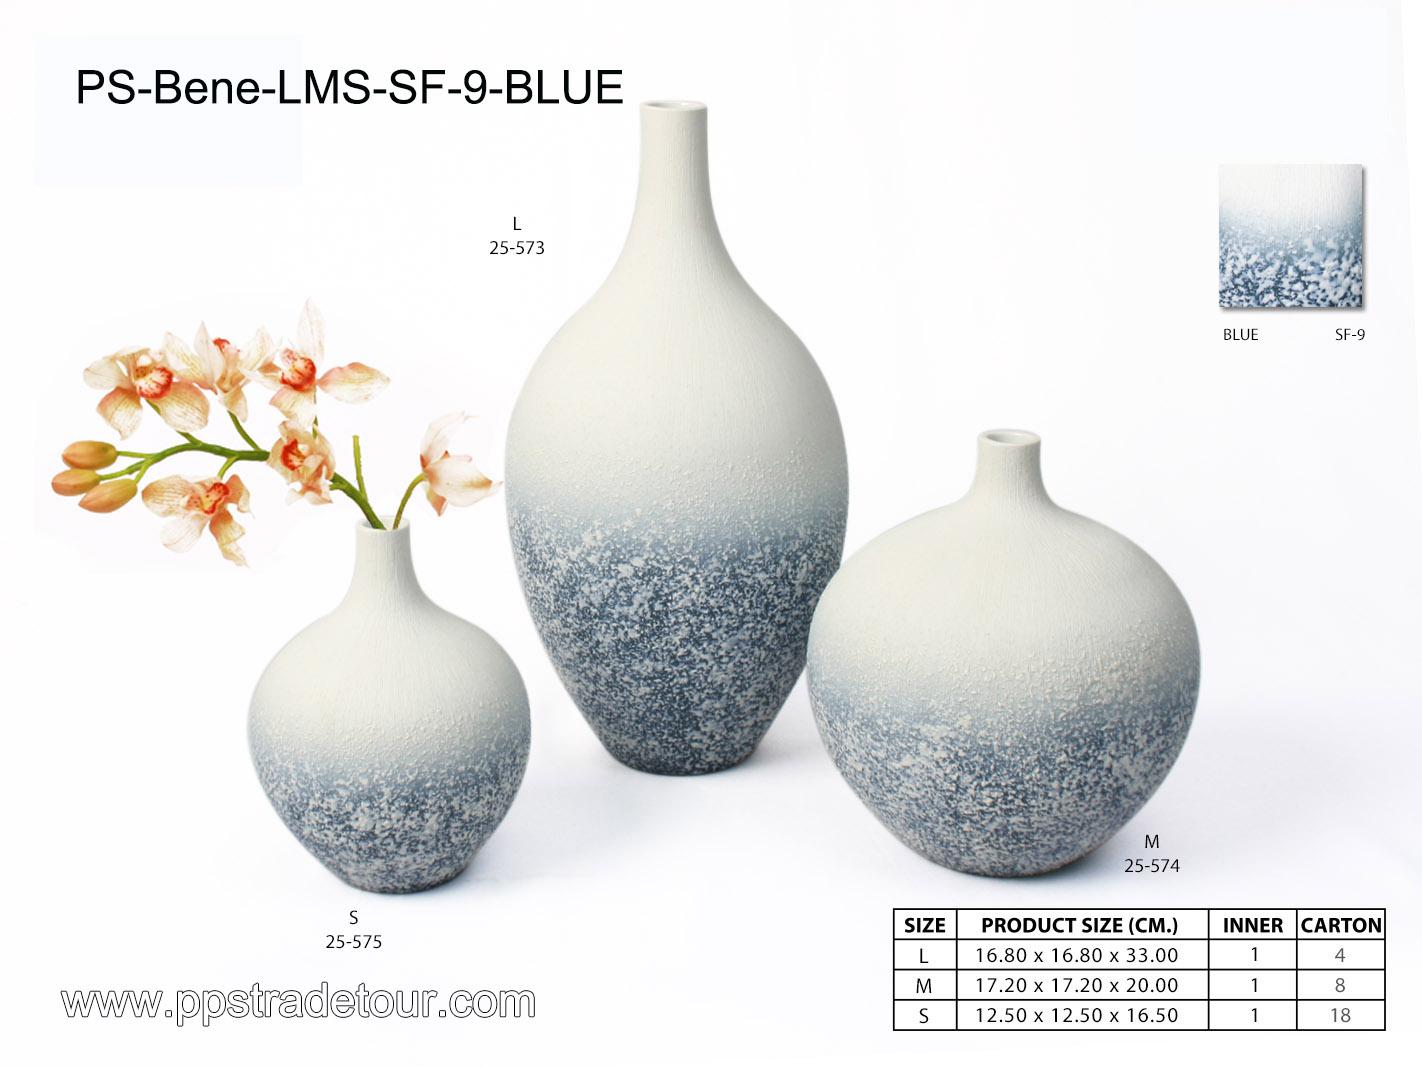 PSCV-BENE-LMS-SF-9-BLUE